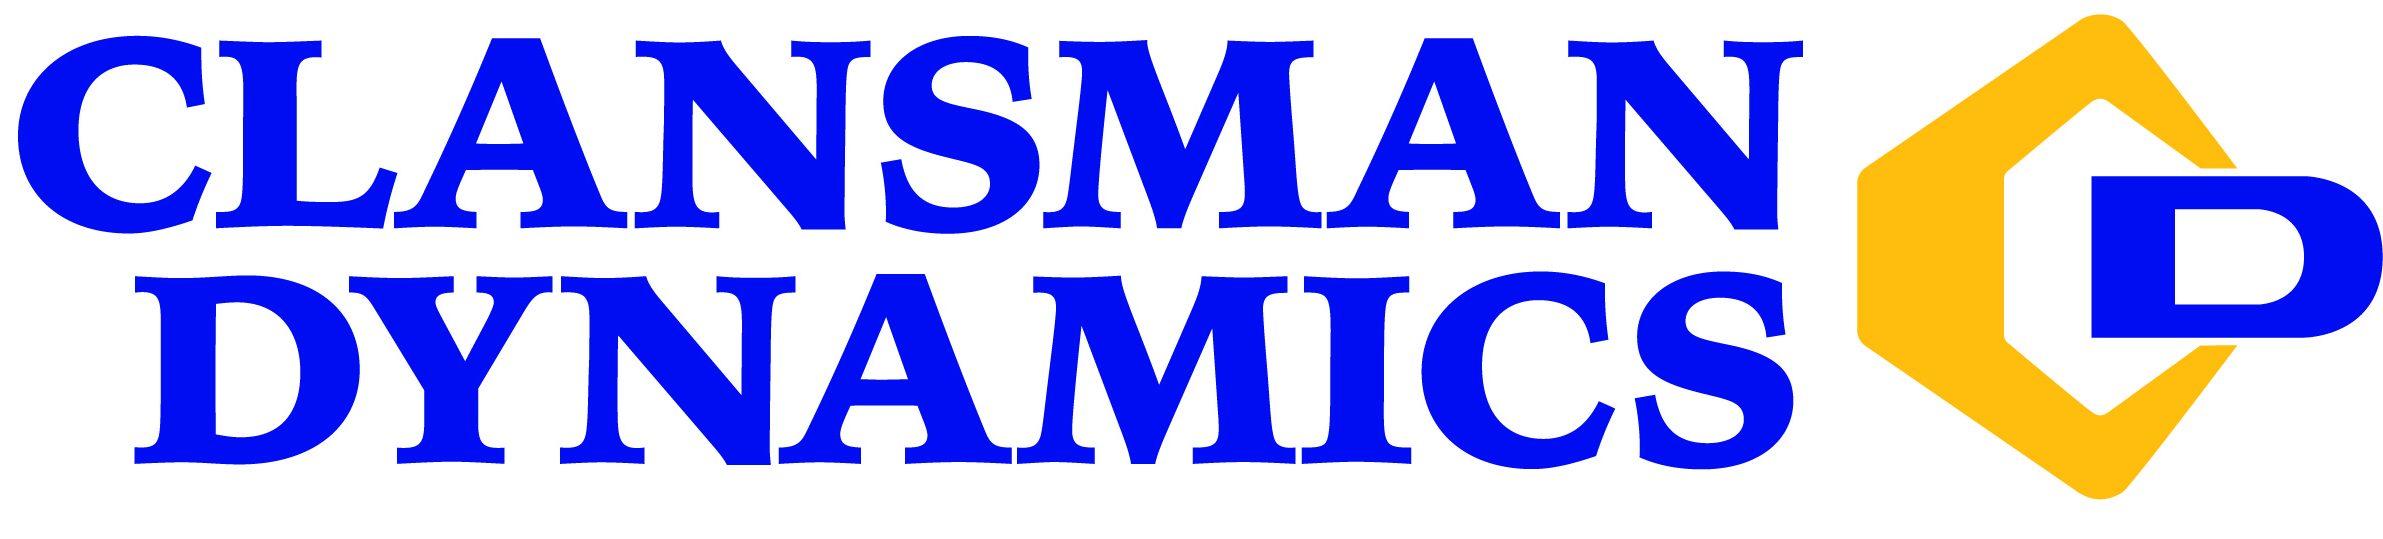 cropped-Clansman-logo-LRG.jpg